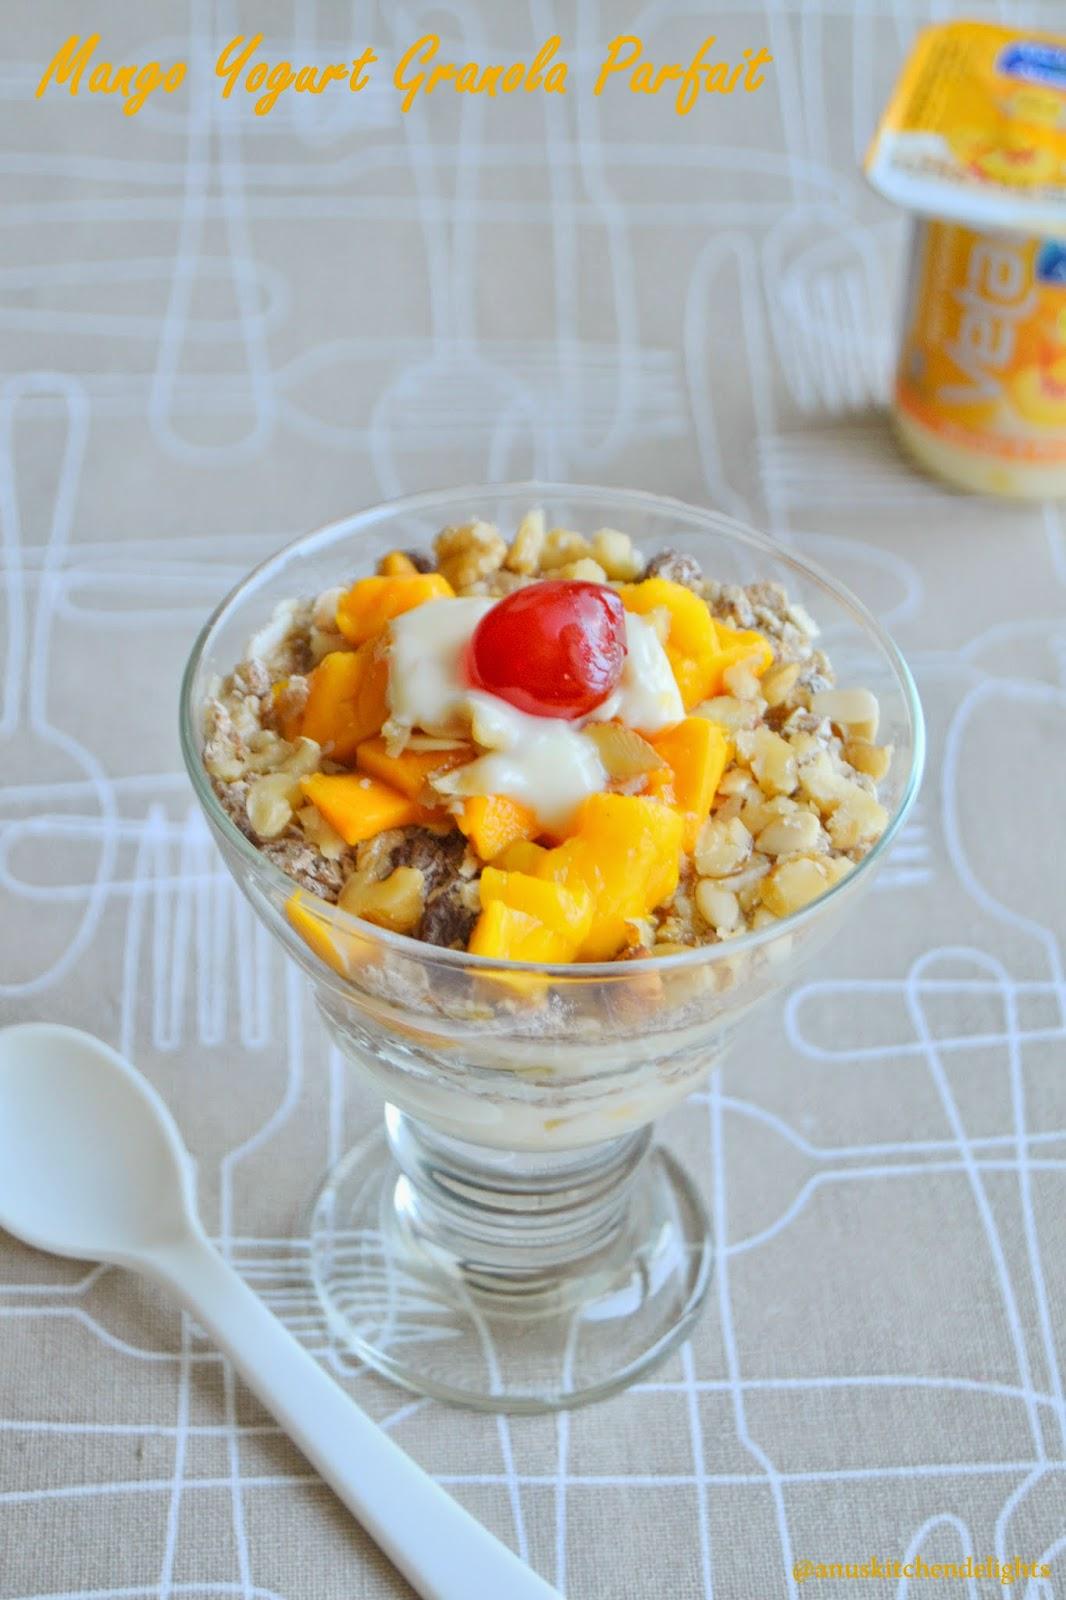 Fruit yogurt granola parfait